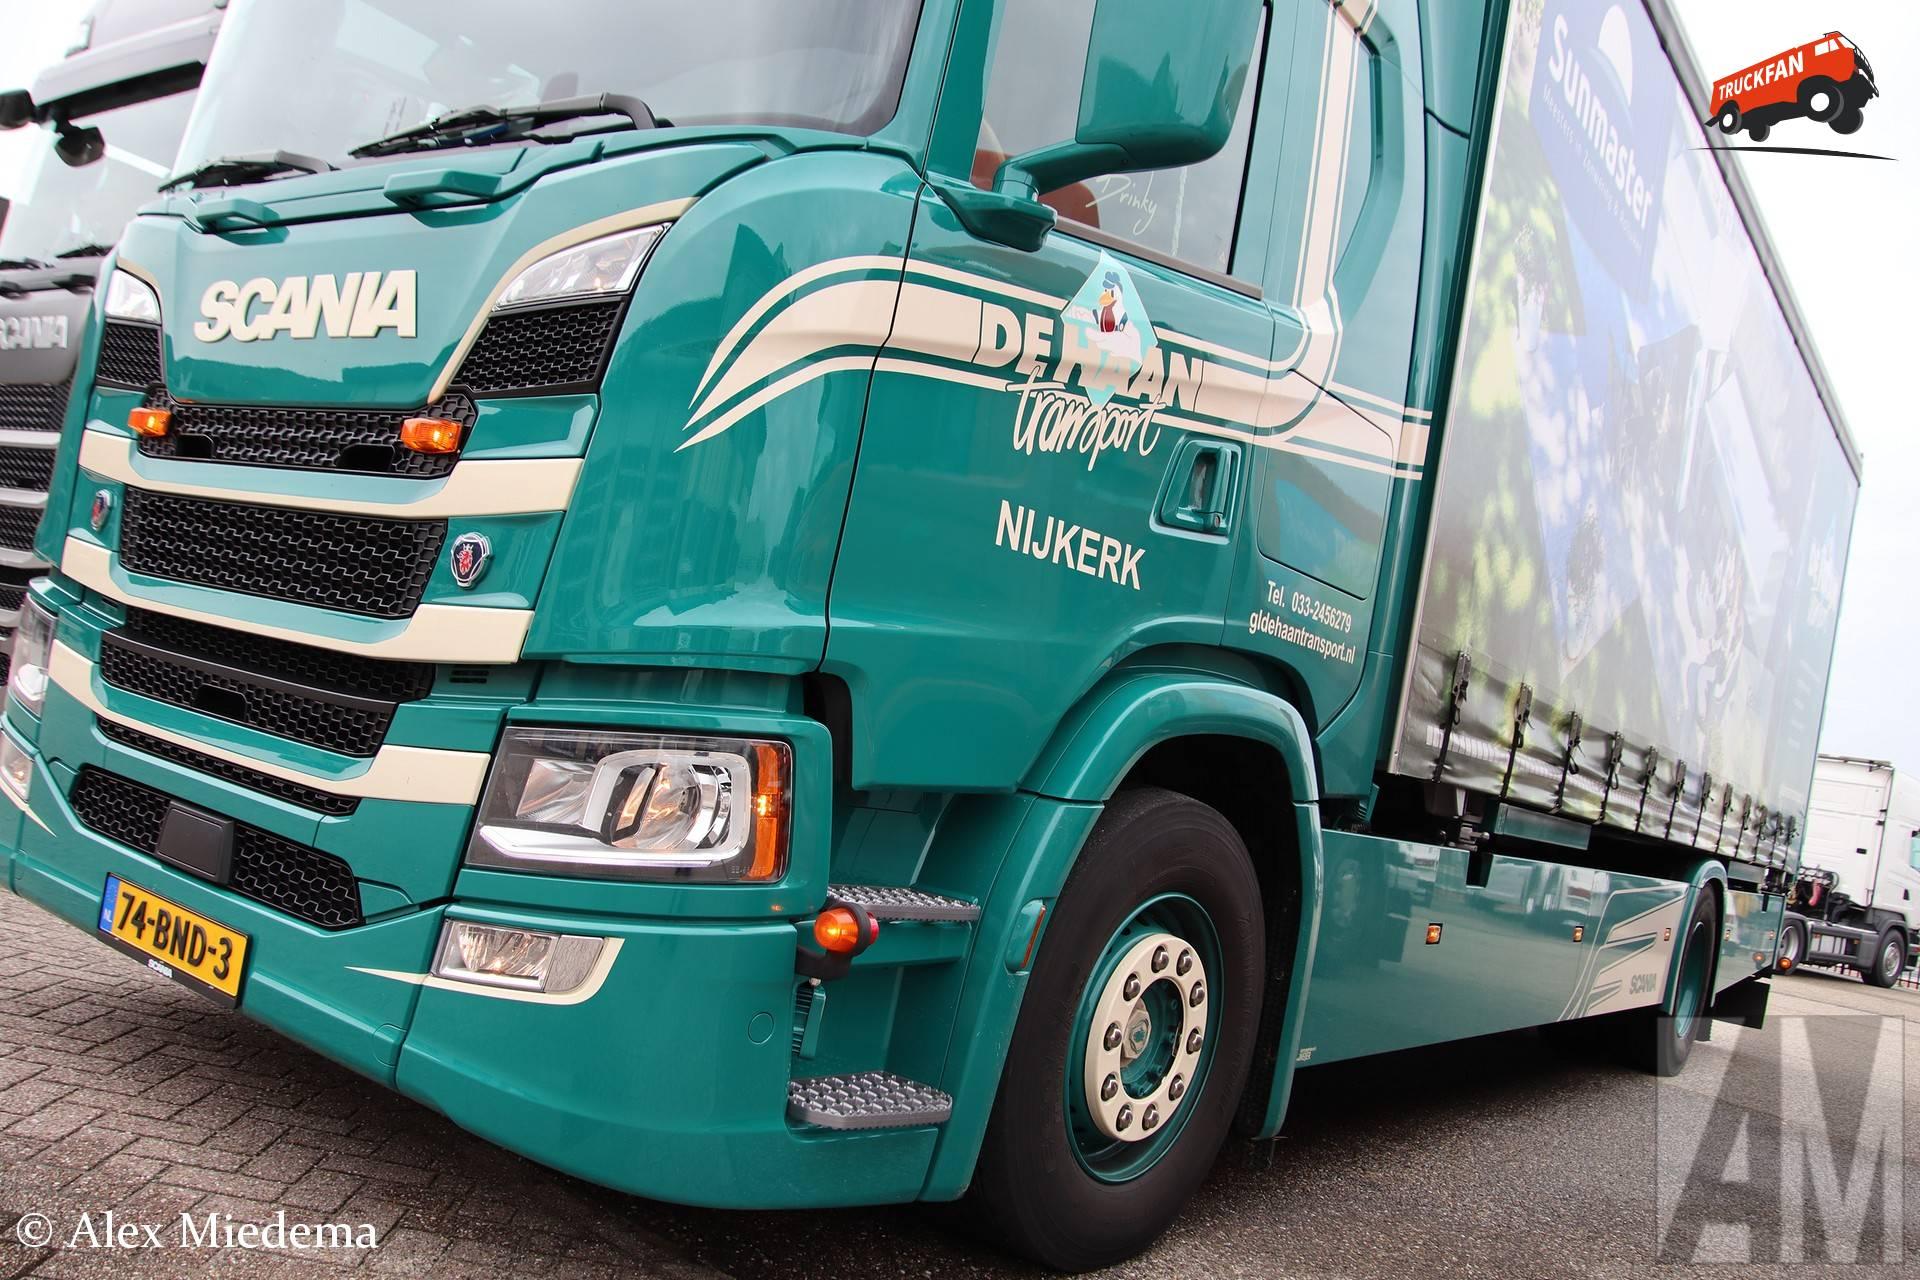 Scania G280